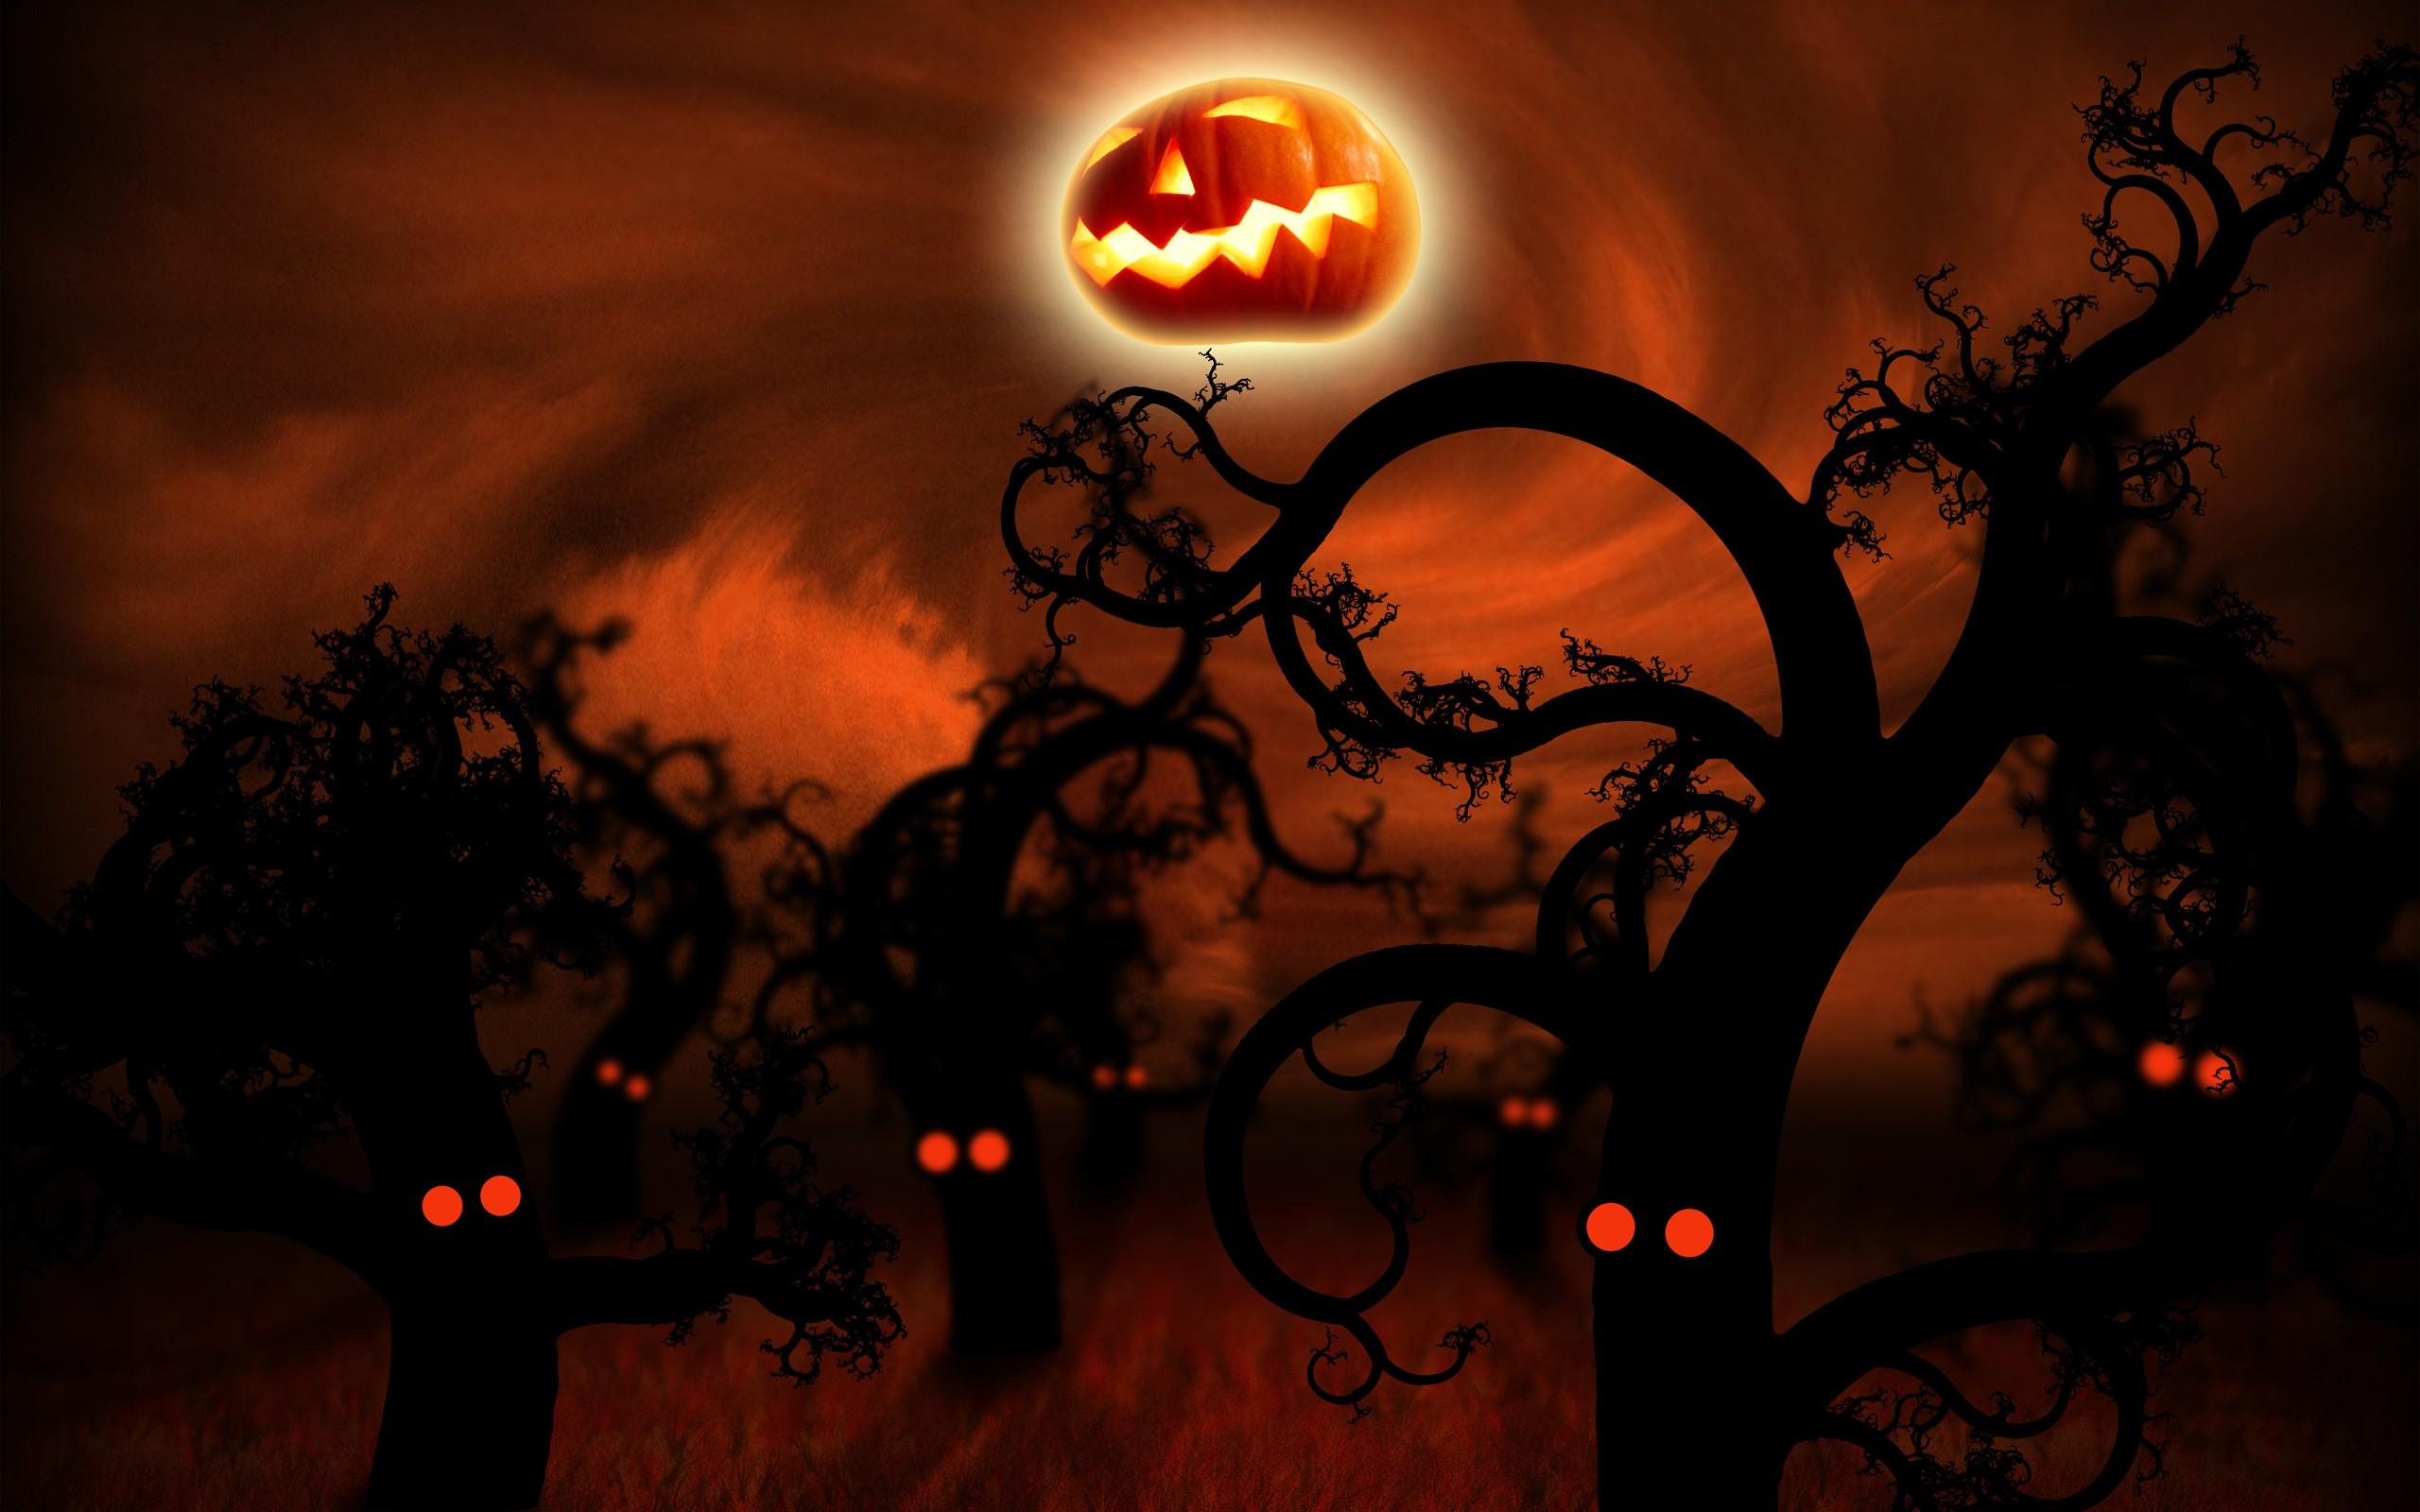 Fantastic Wallpaper Halloween Steampunk - 240652-cool-halloween-backgrounds-desktop-2560x1600-tablet  Trends_648497.jpg